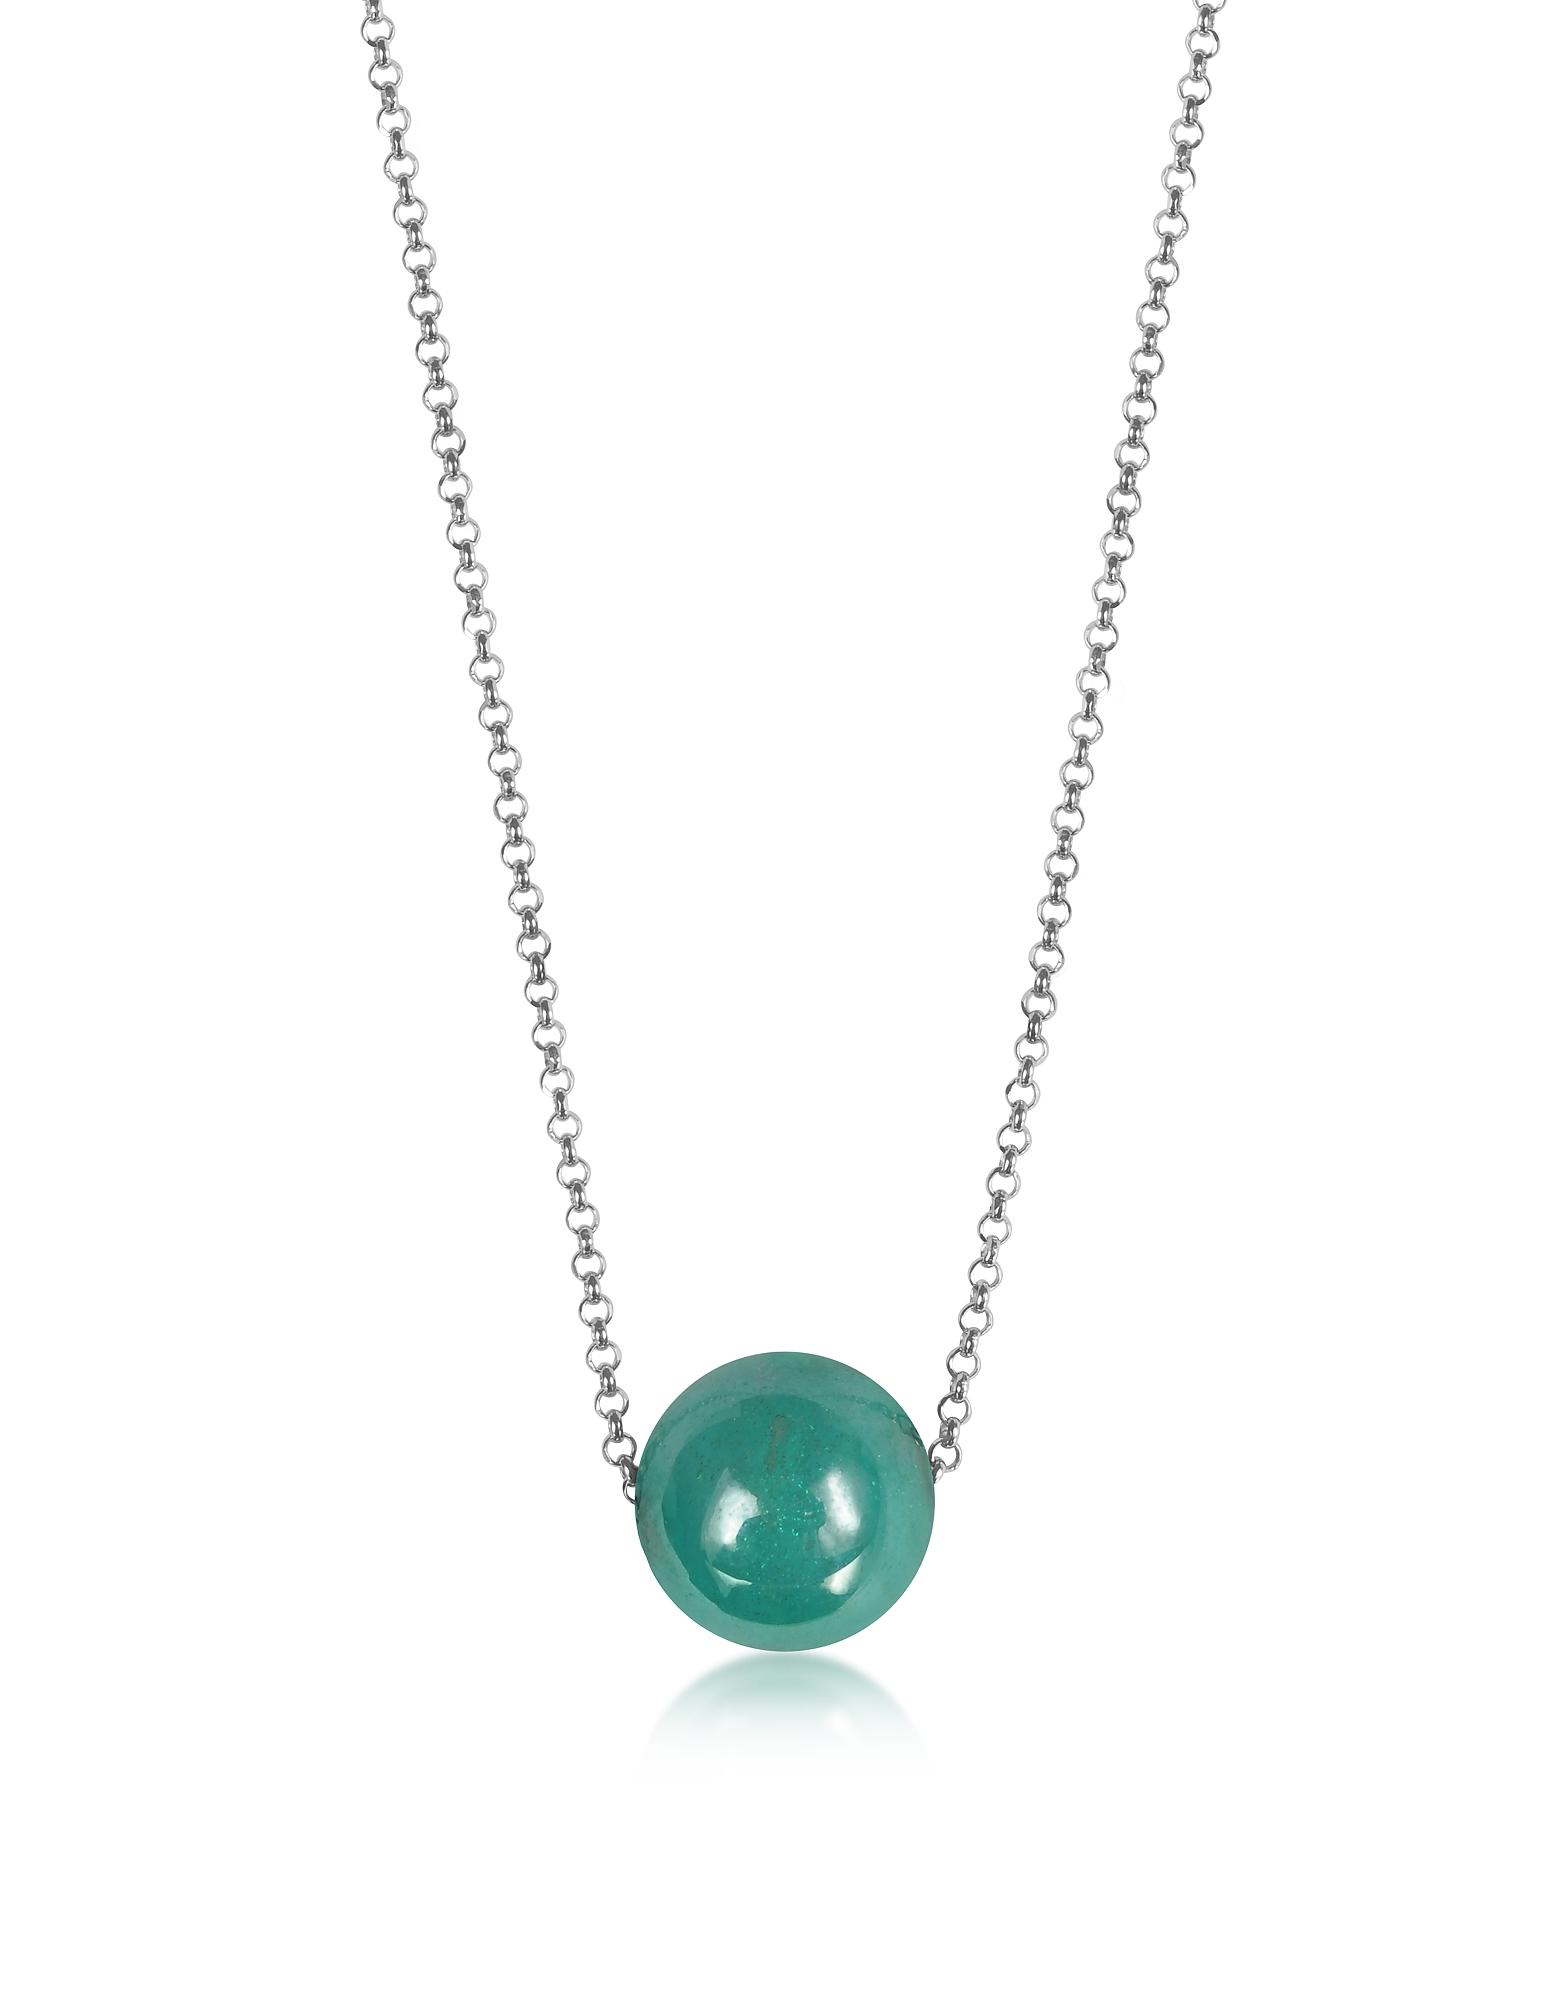 Antica Murrina Necklaces, Perleadi Turquoise Murano Glass Bead Chain Necklace